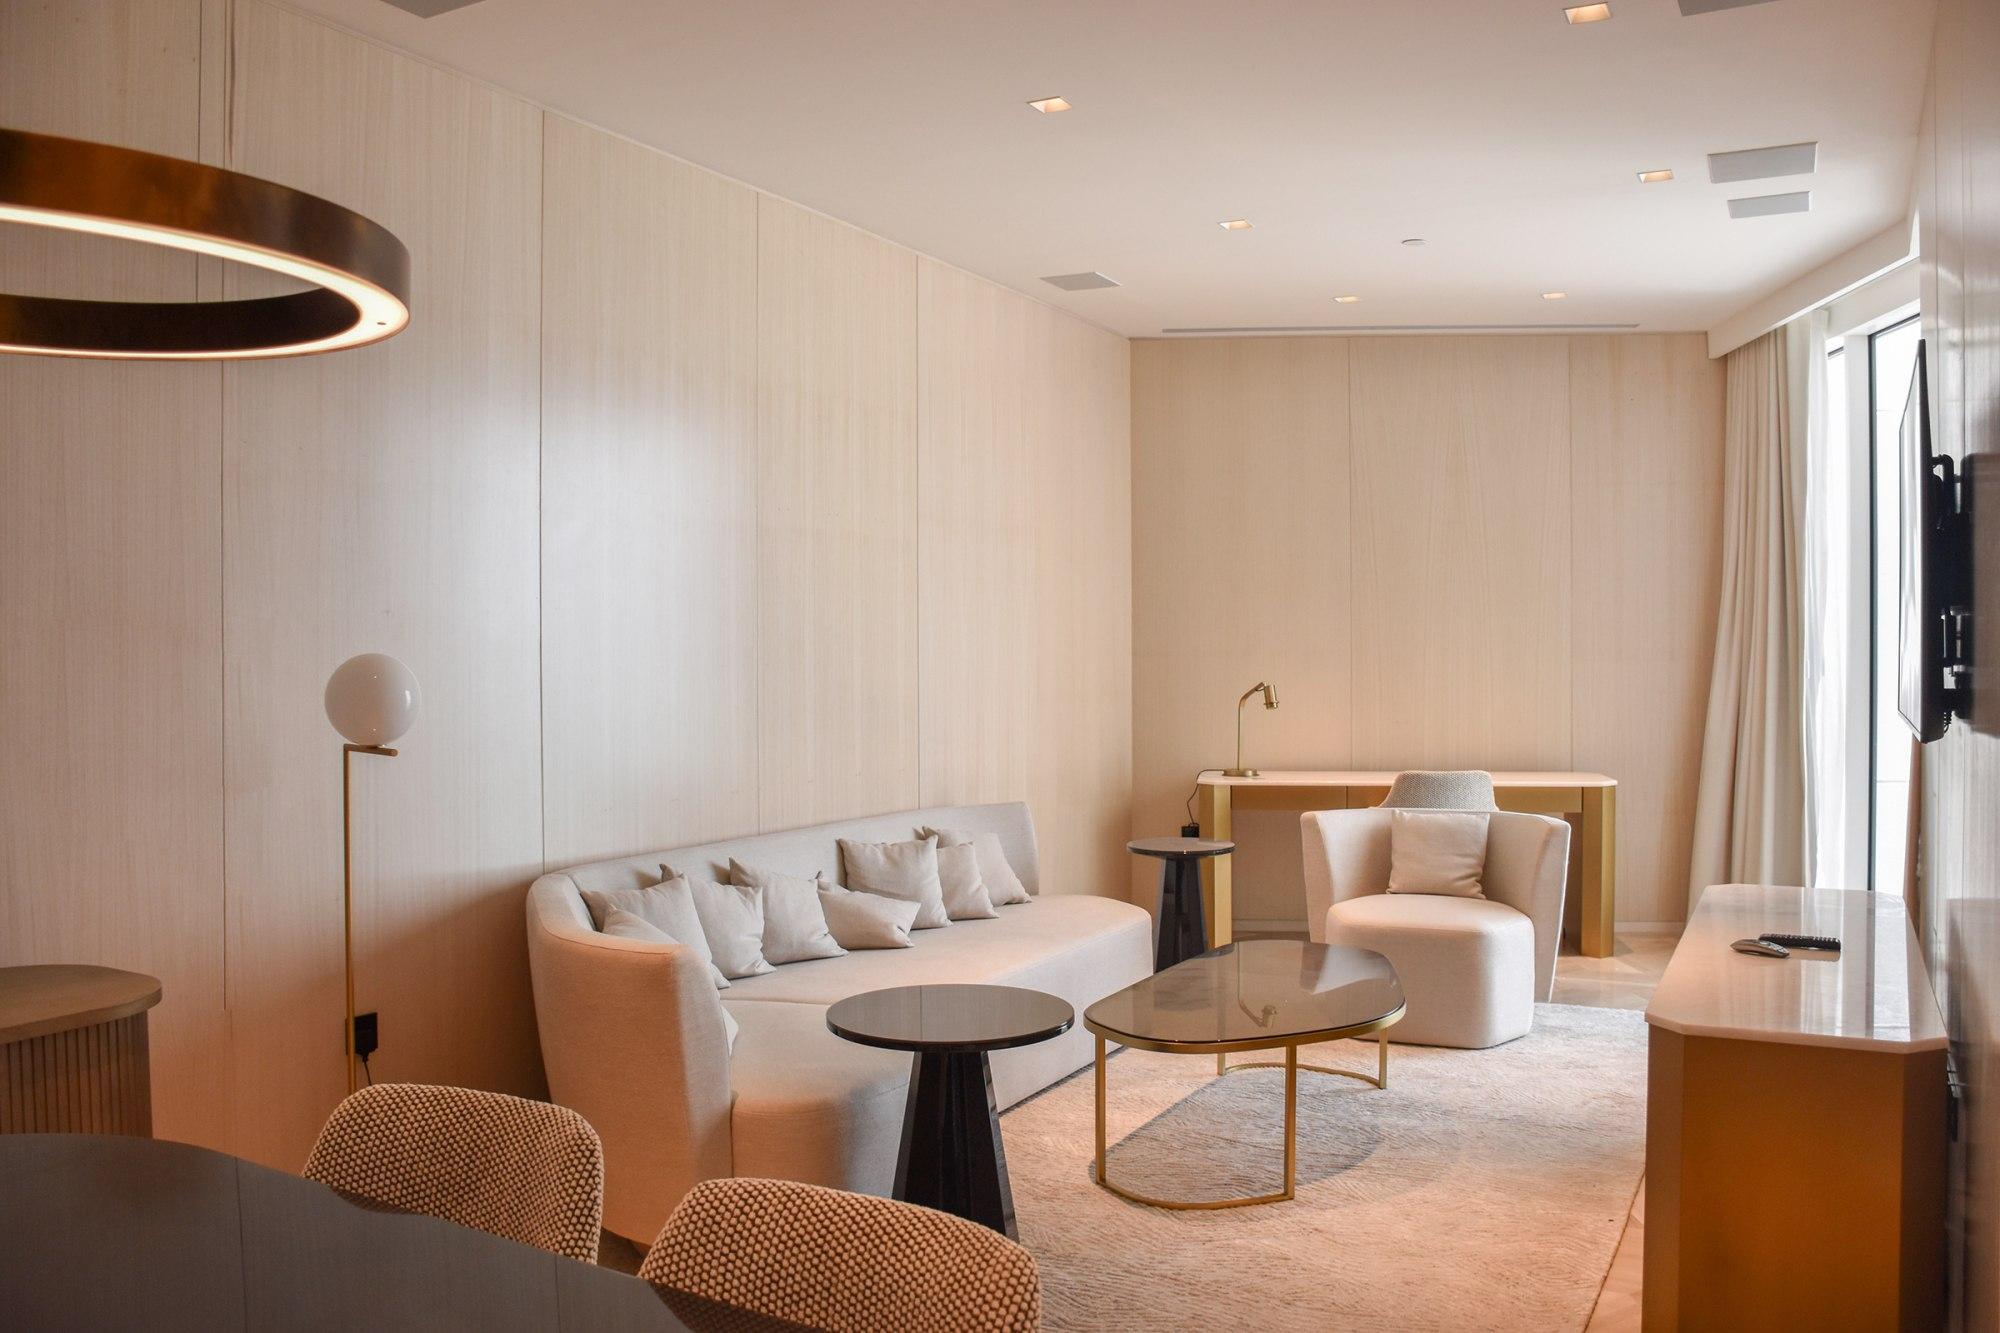 5 Star Resort Hotel One Bed for Investor